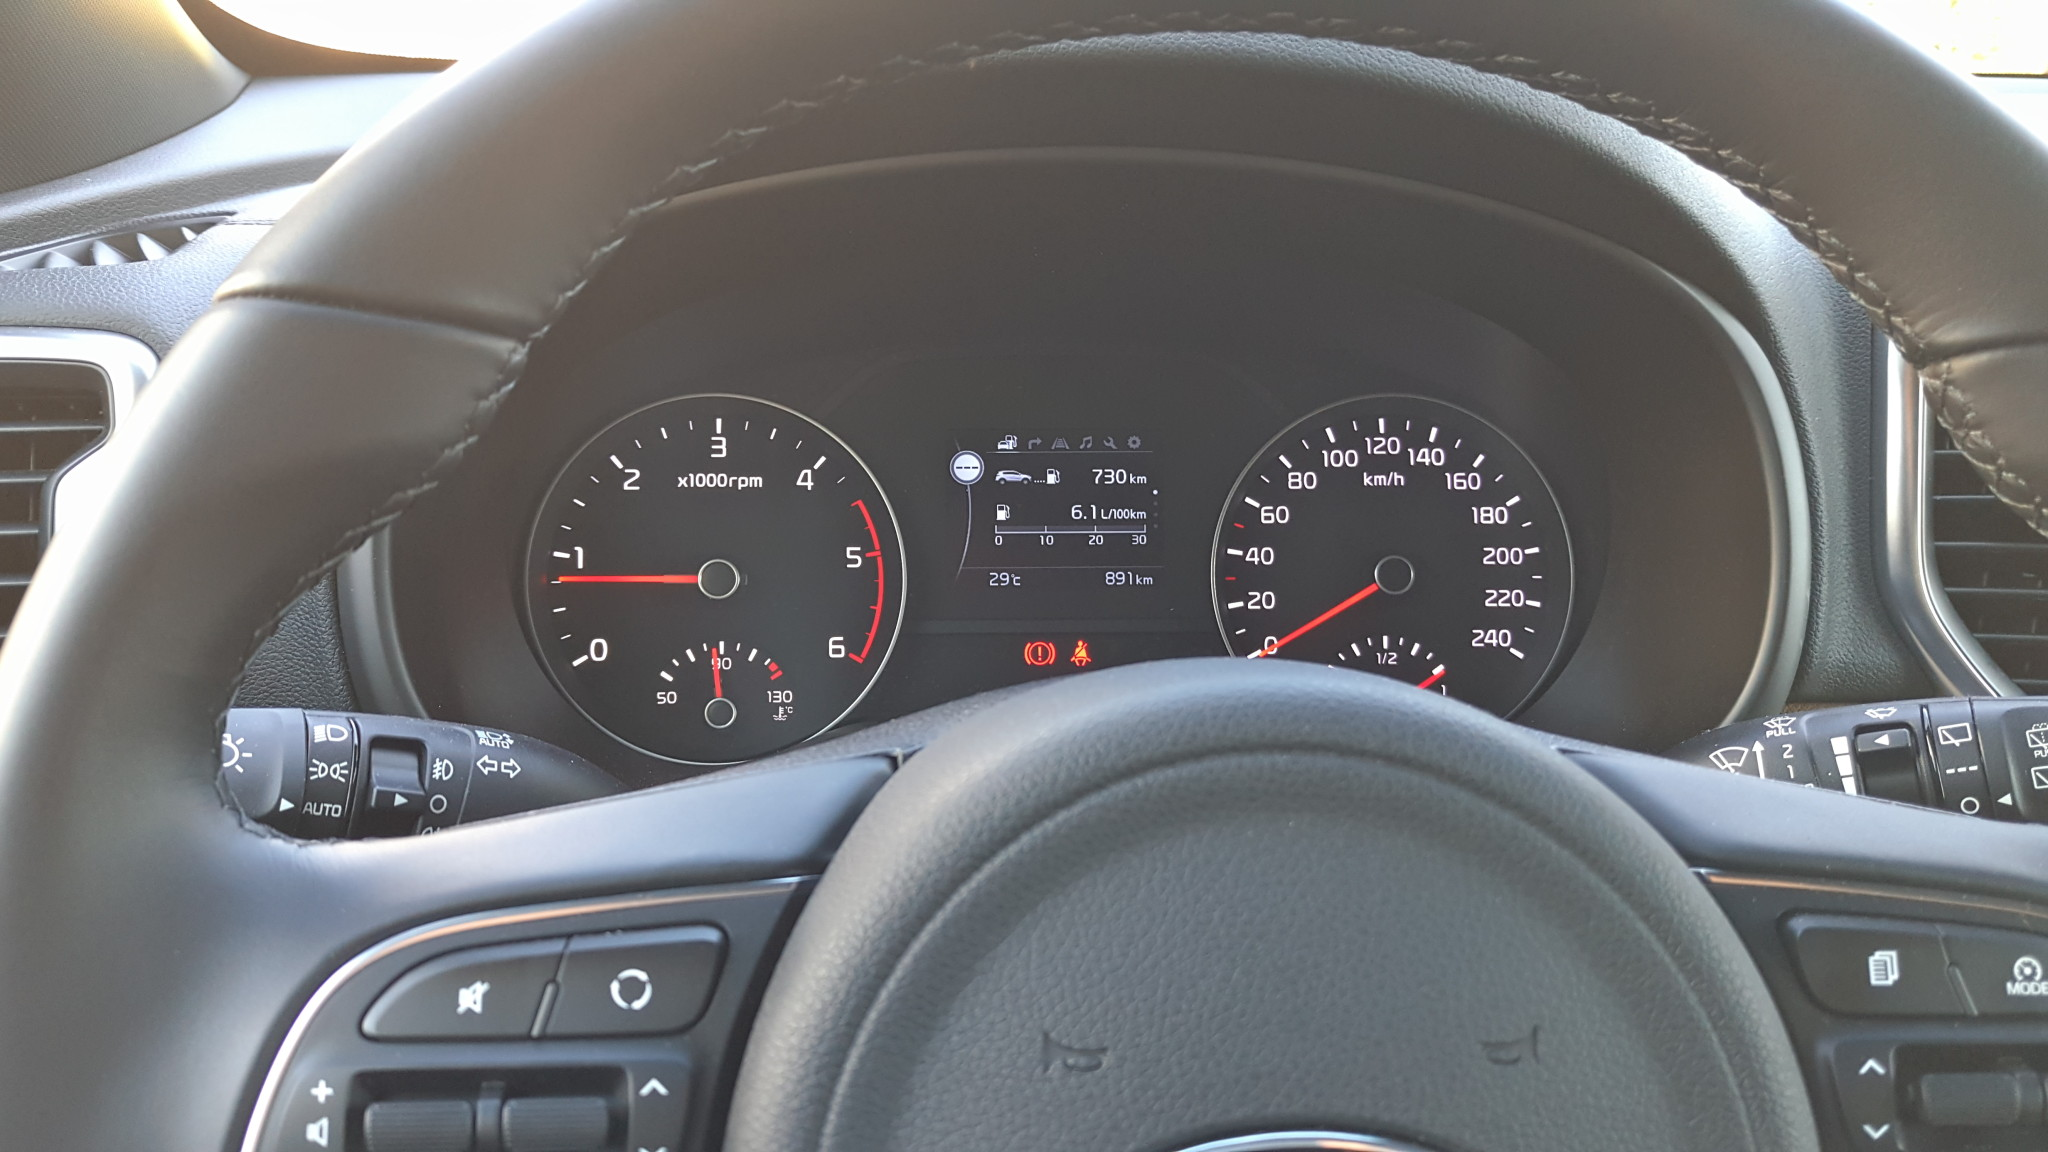 Kia Sportage 1.7 CRDi TX Premium do Bito1963 B6qzpj